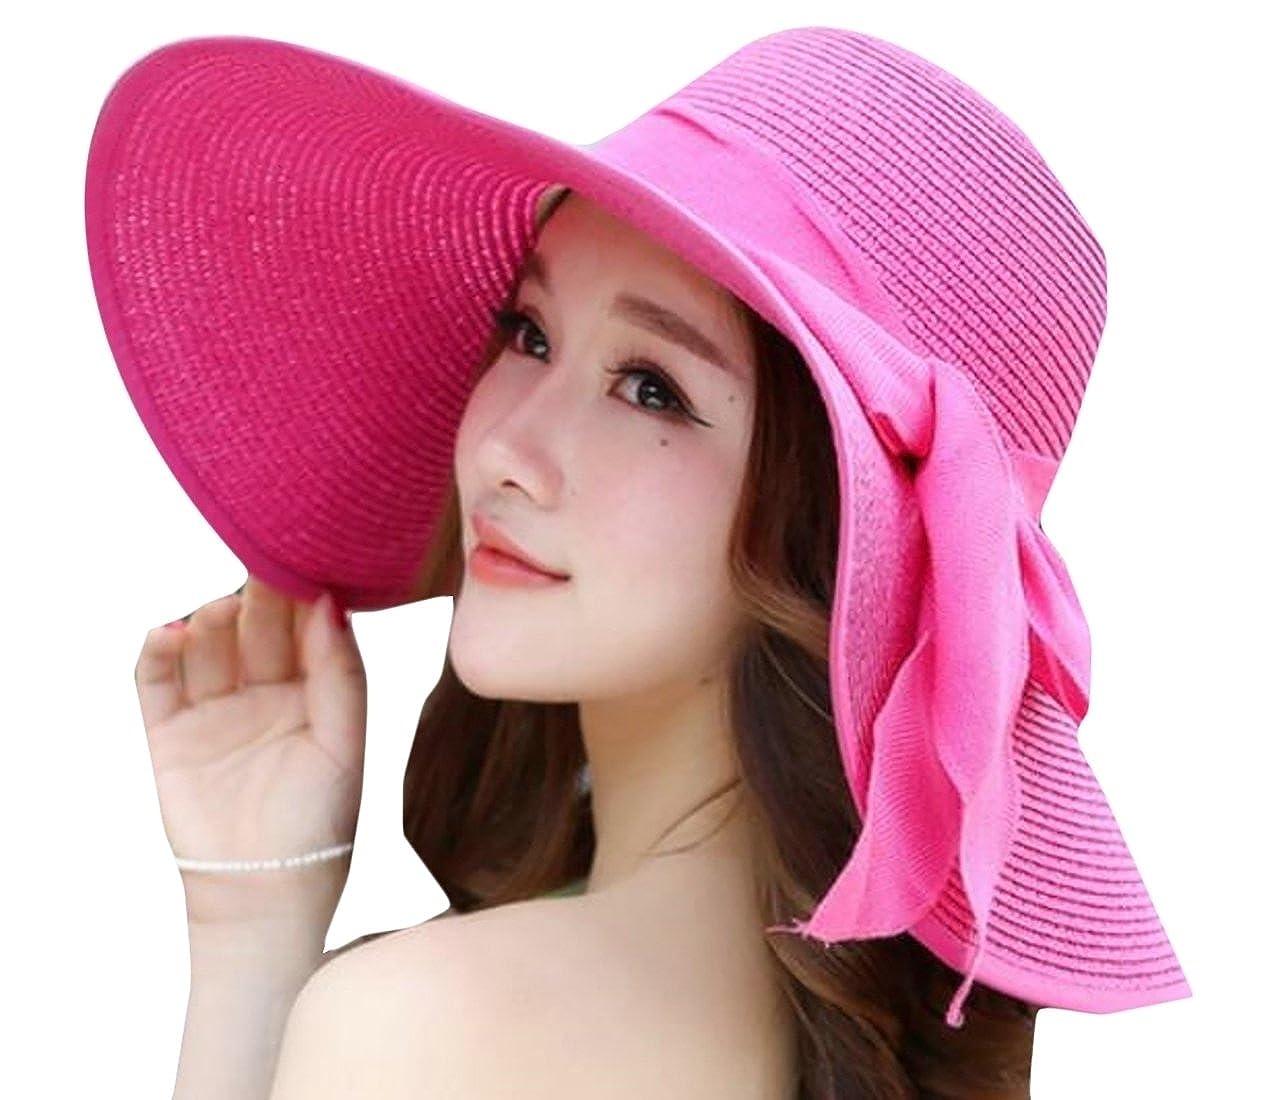 WSPLYSPJY Womens Beach Hat Women Large Brim Straw Sun Hats Roll up Packable UPF 50+